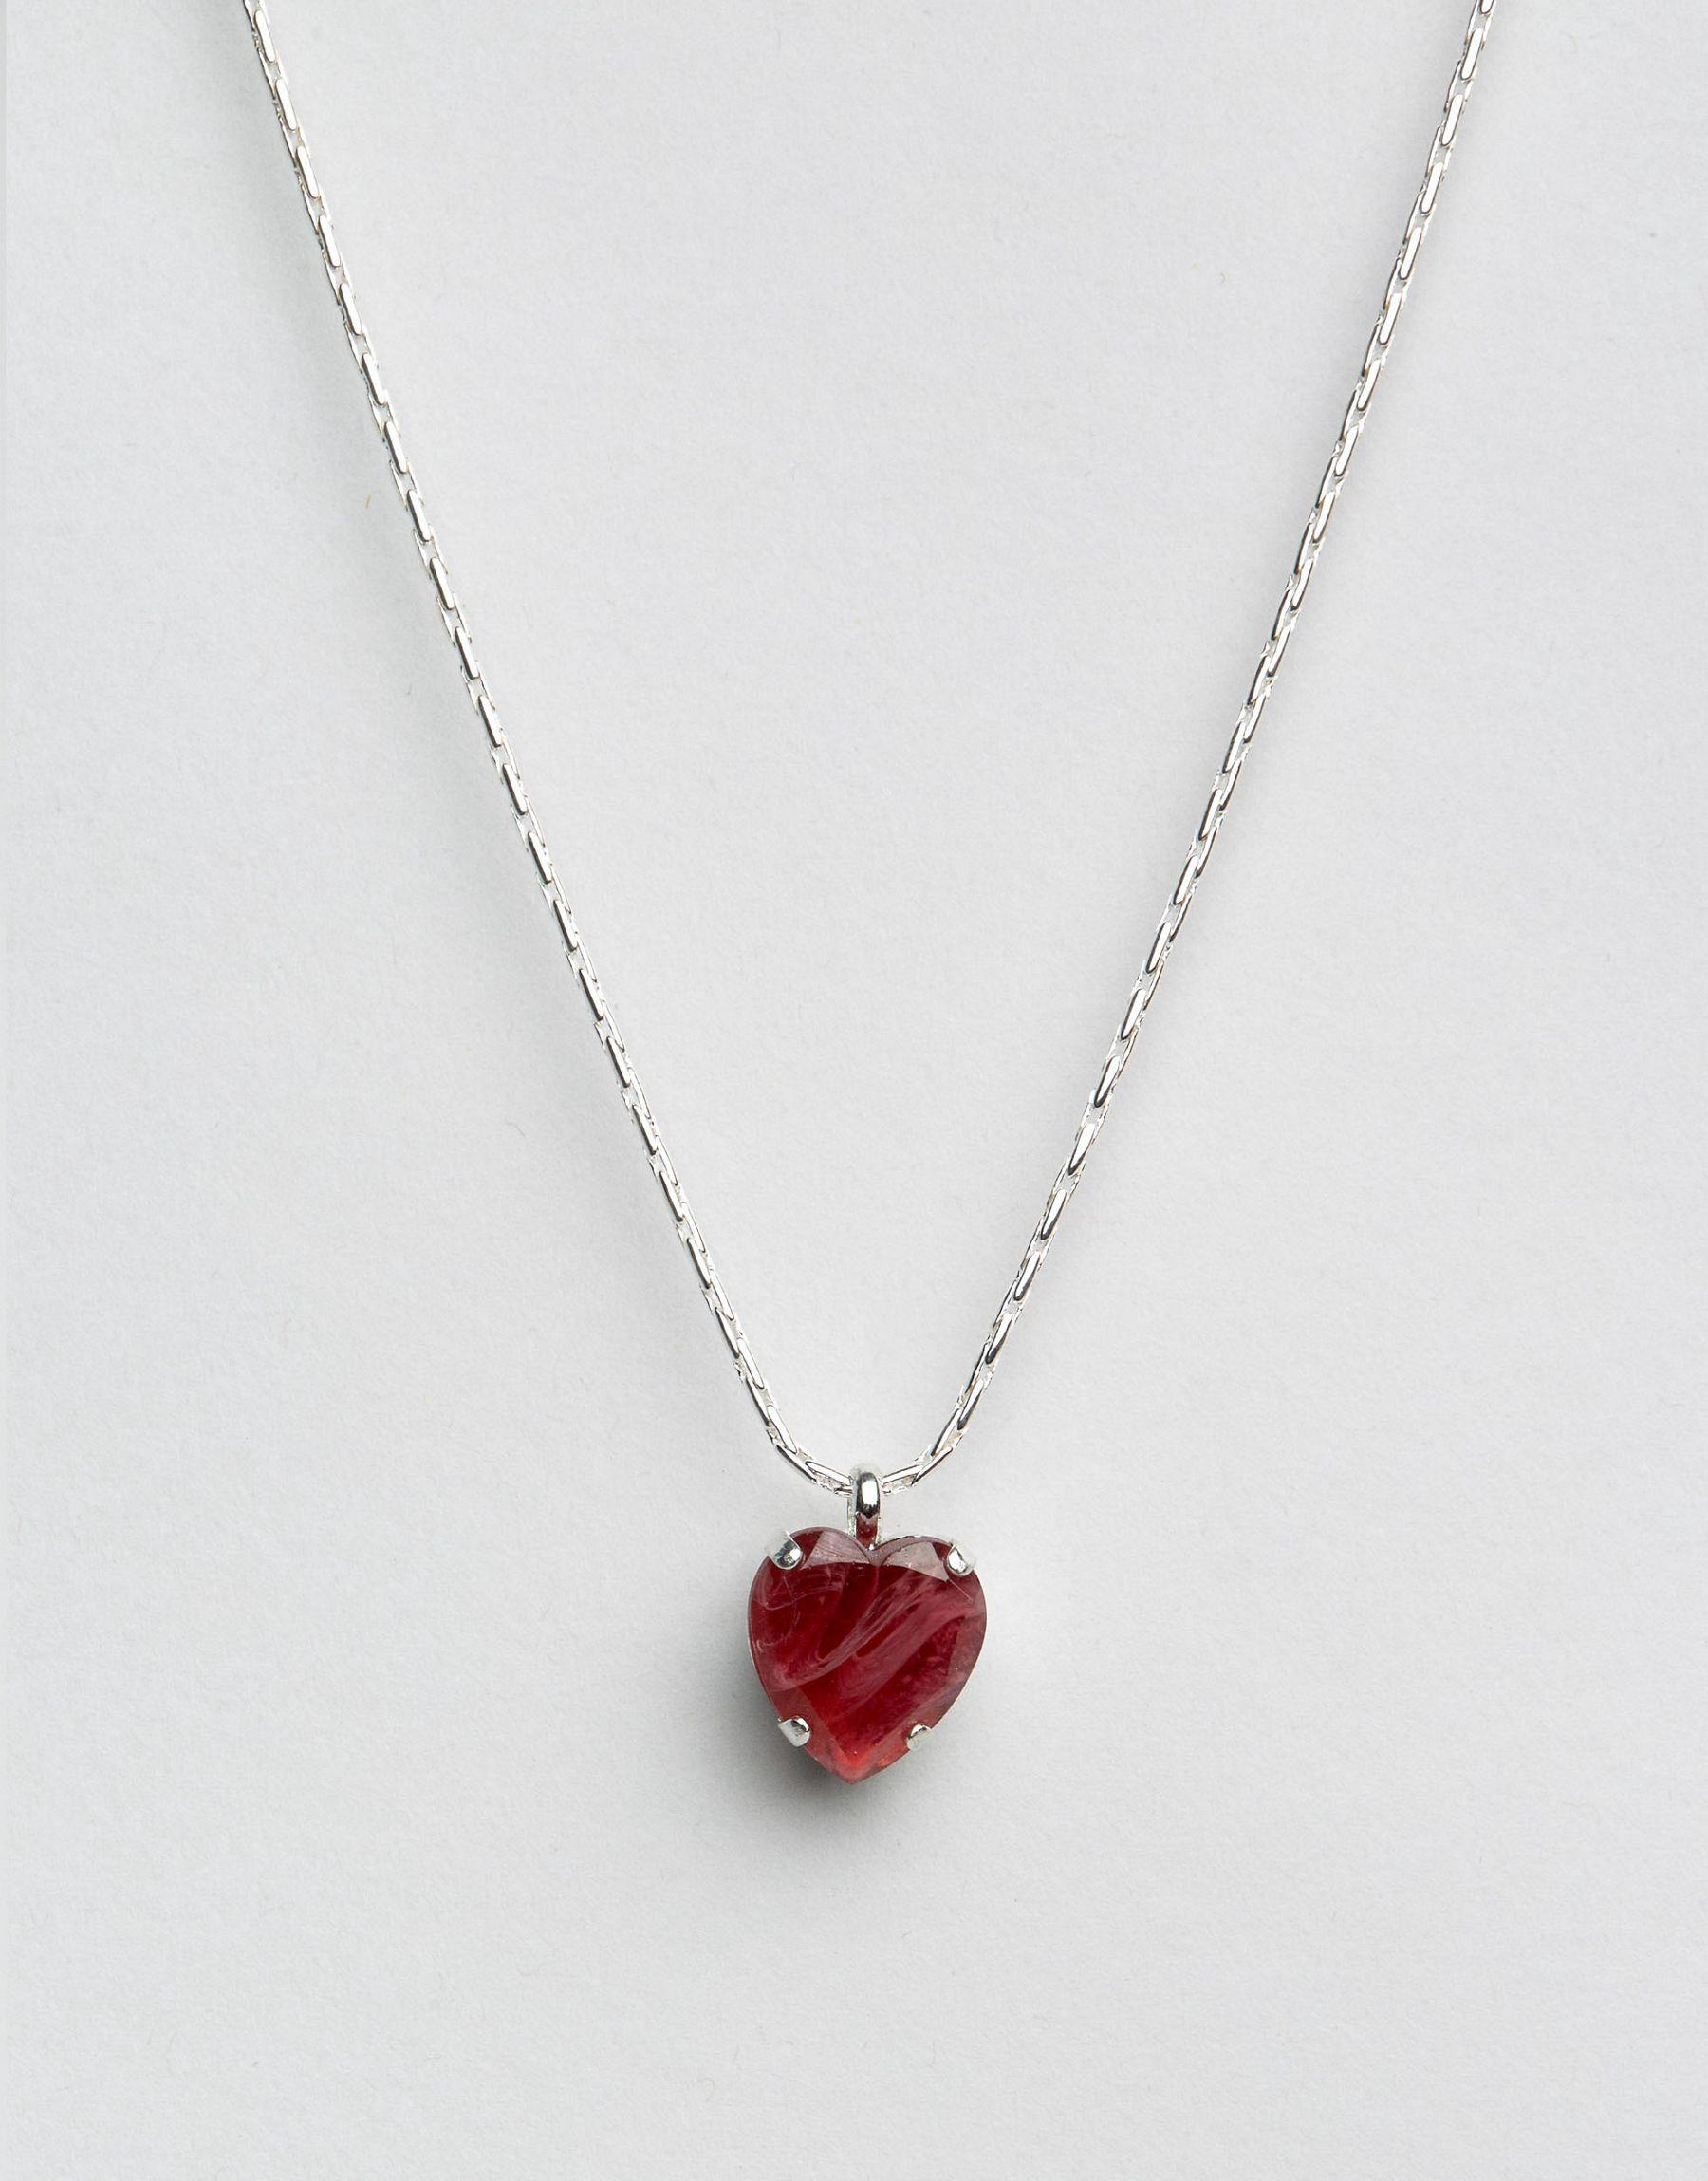 Lyst Krystal Swarovski Crystal Heart Pendant Necklace In Red